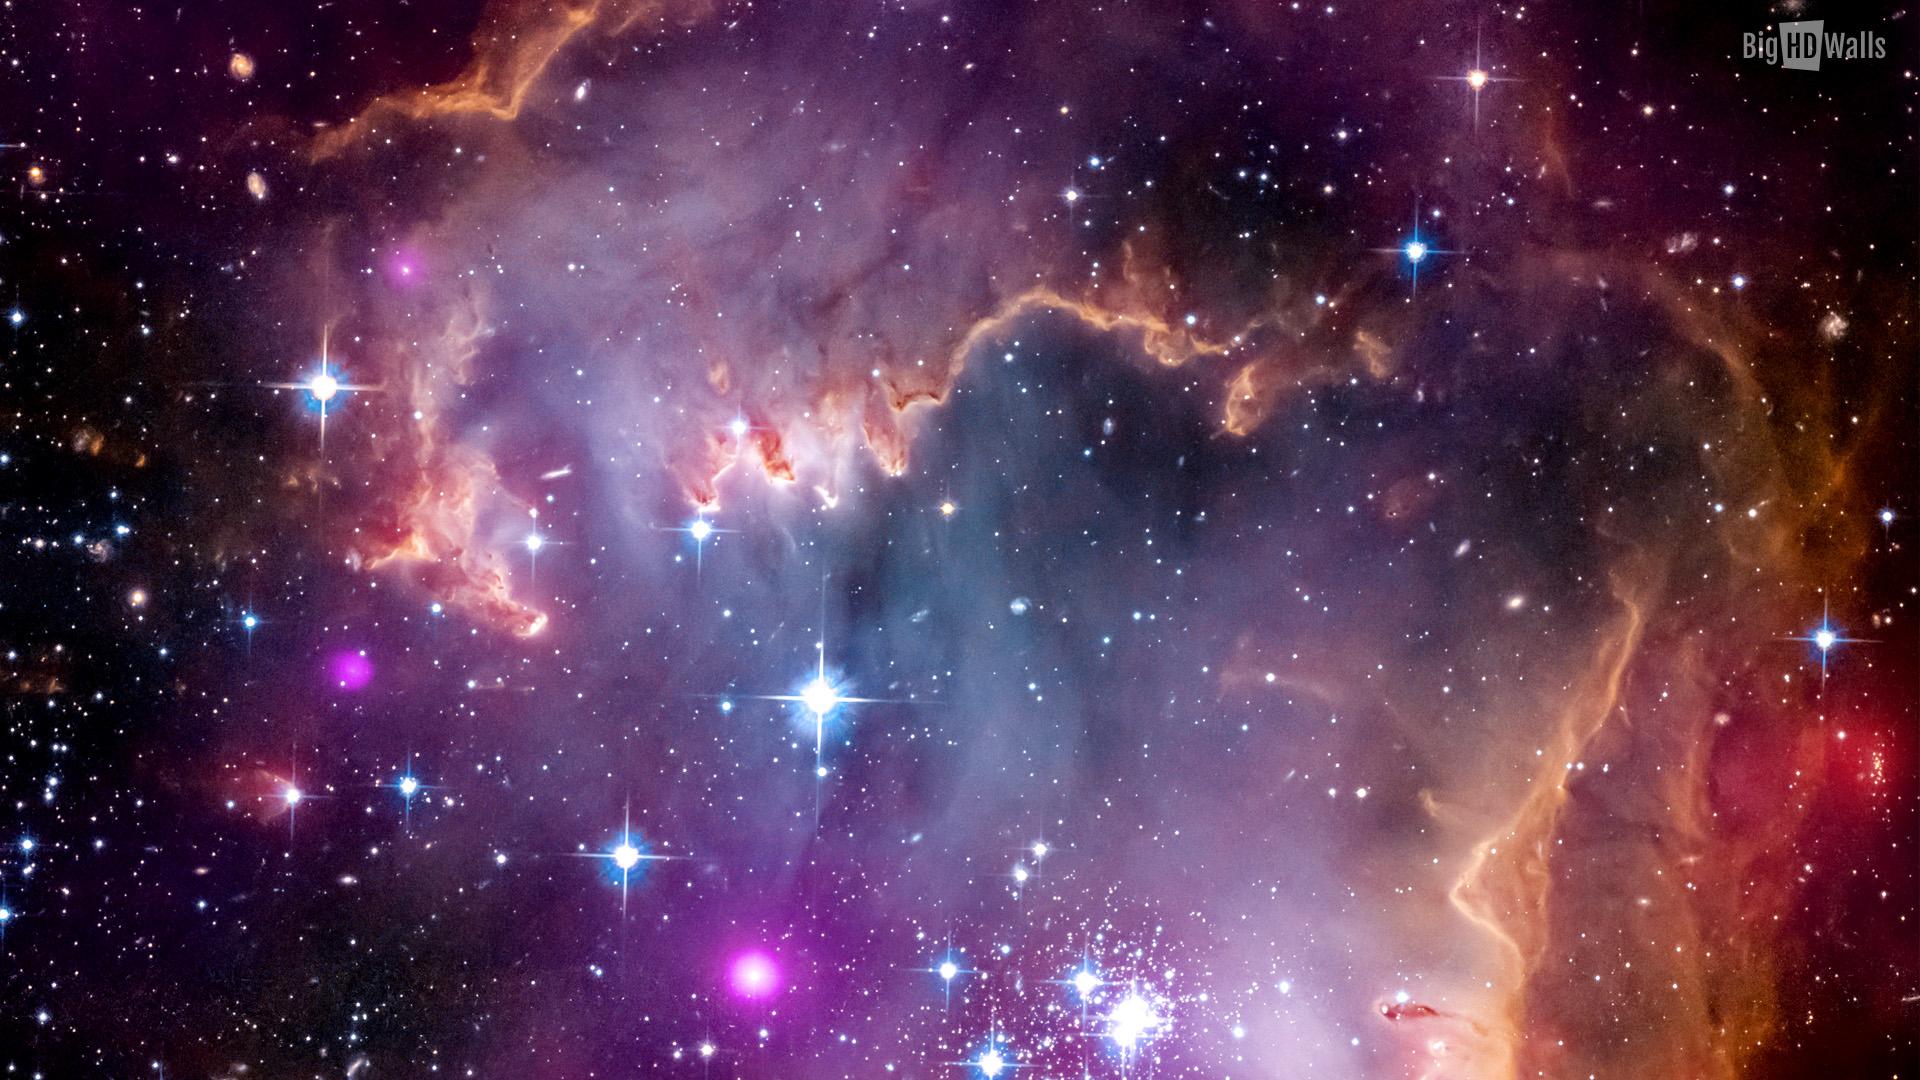 10 Amazing Space HD Wallpaper BigHDWalls 1920x1080